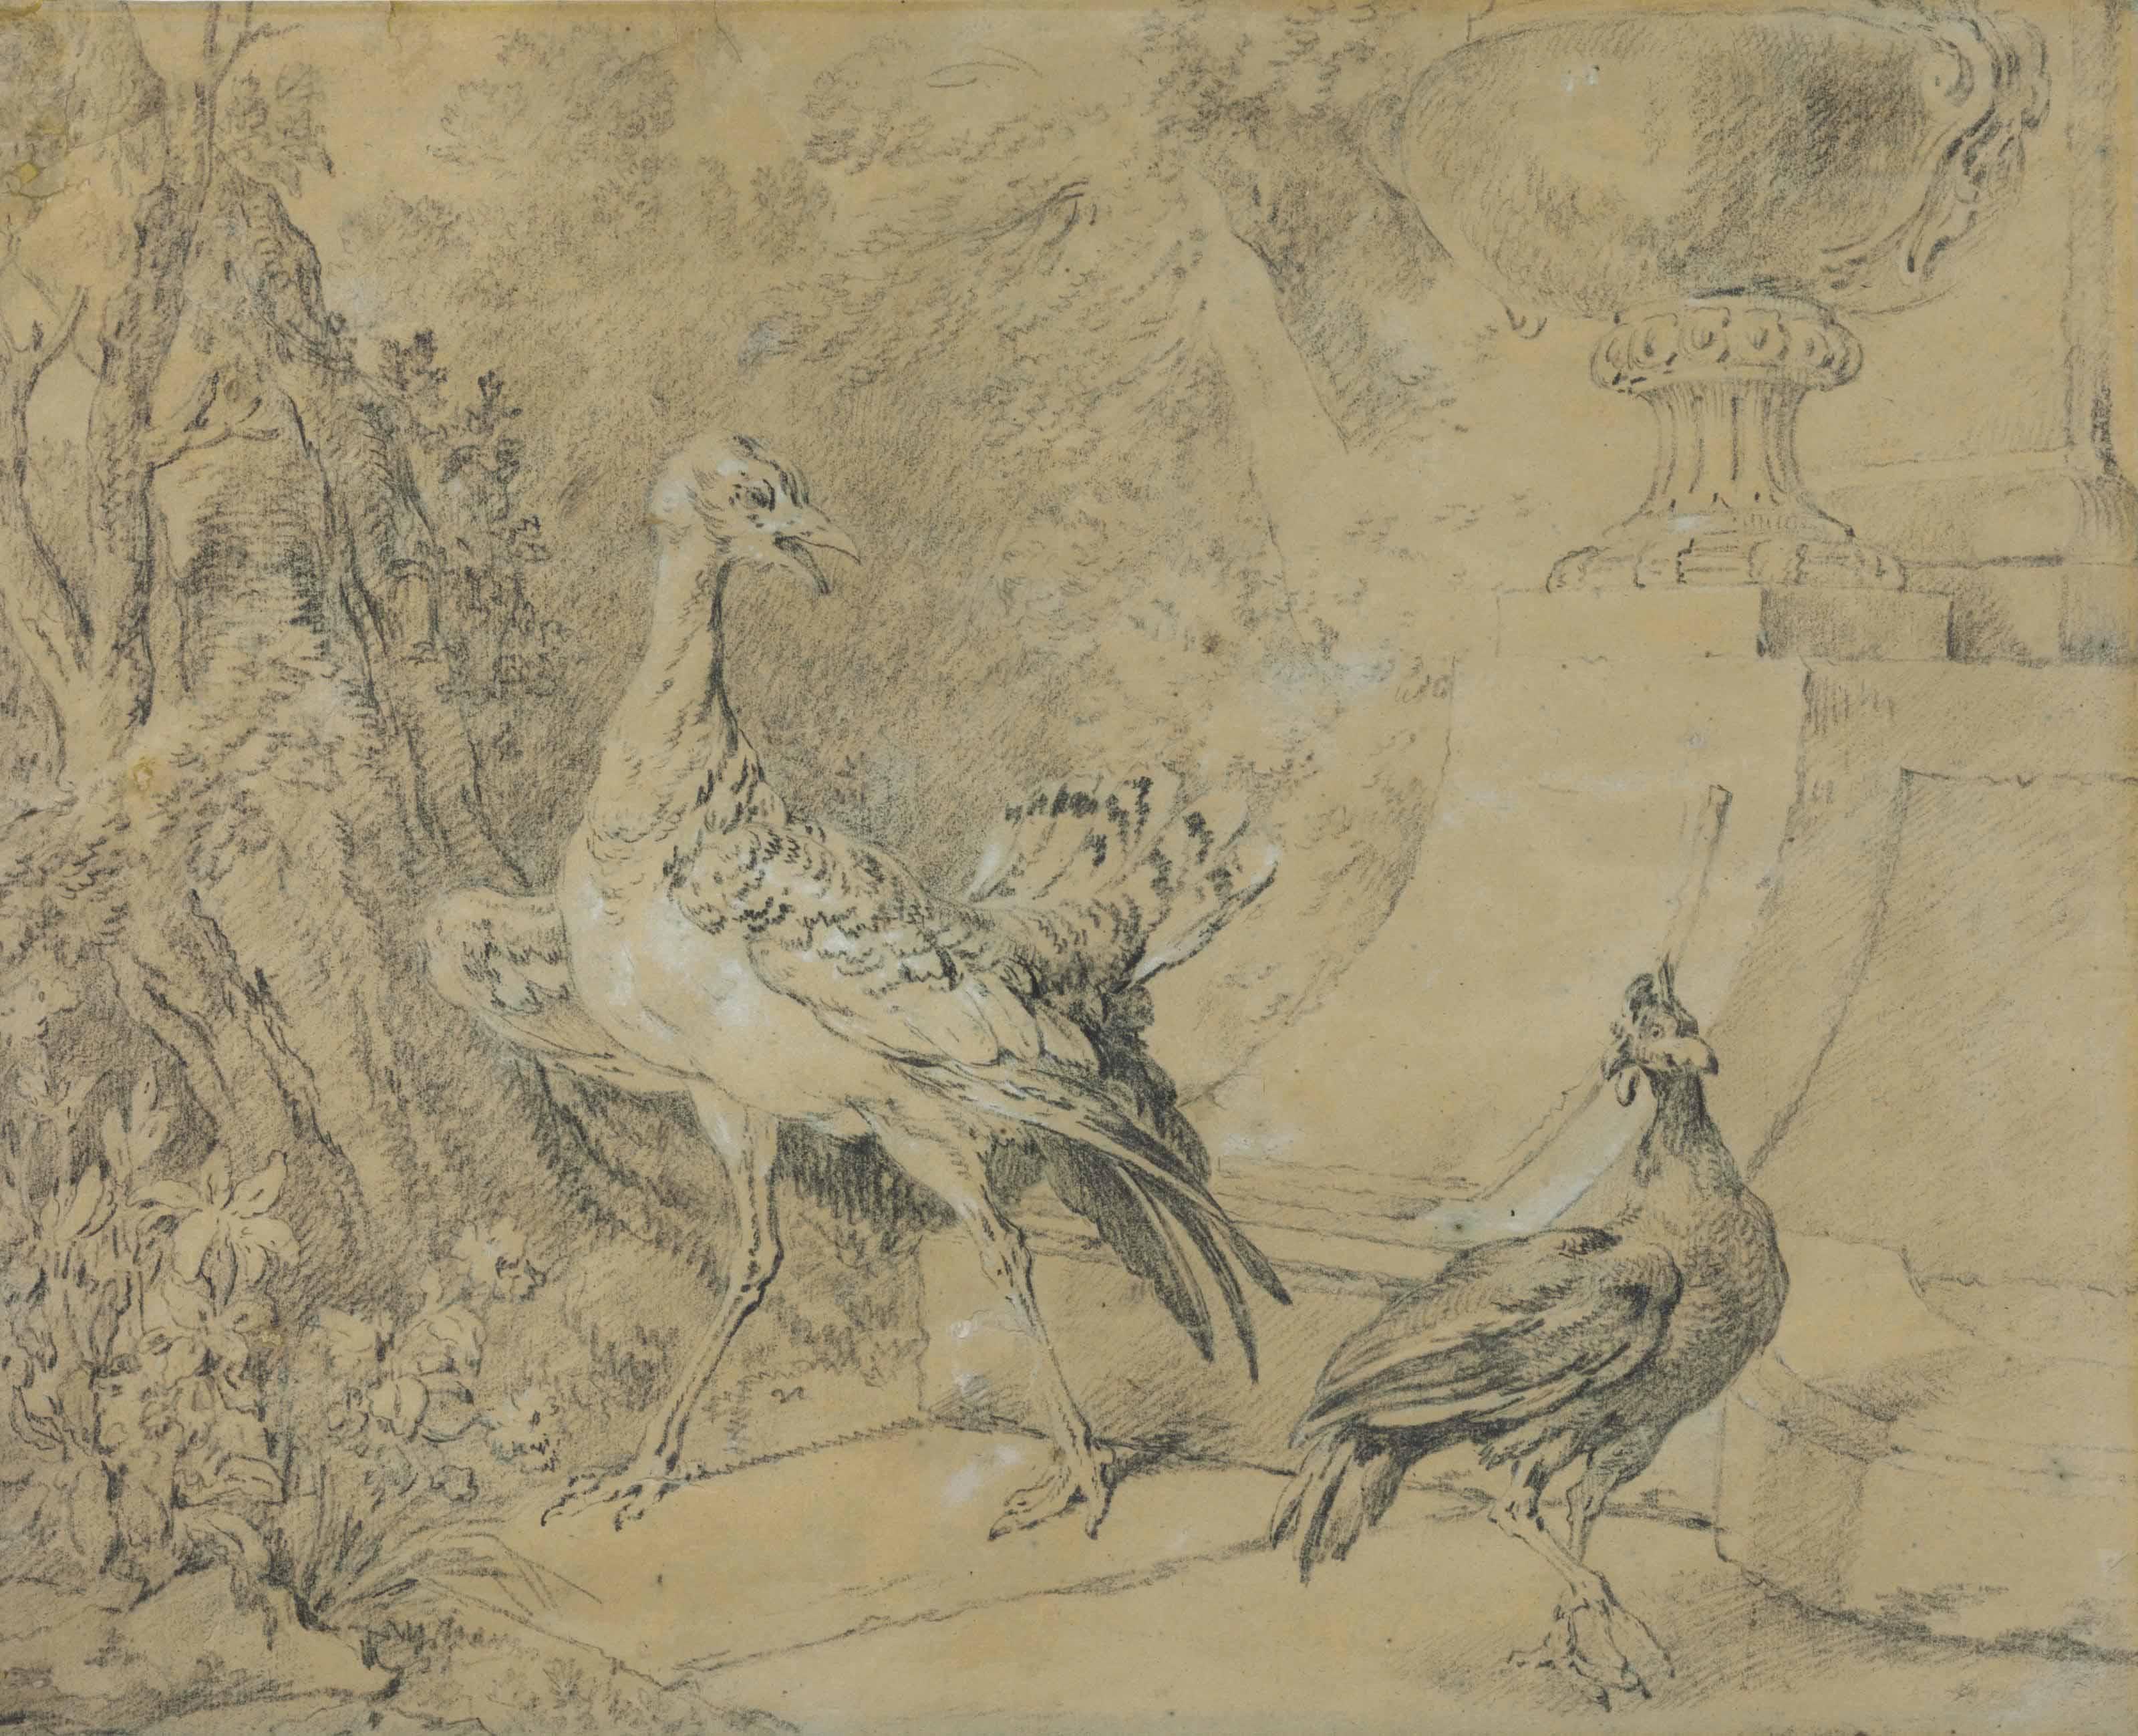 Two birds in a landscape